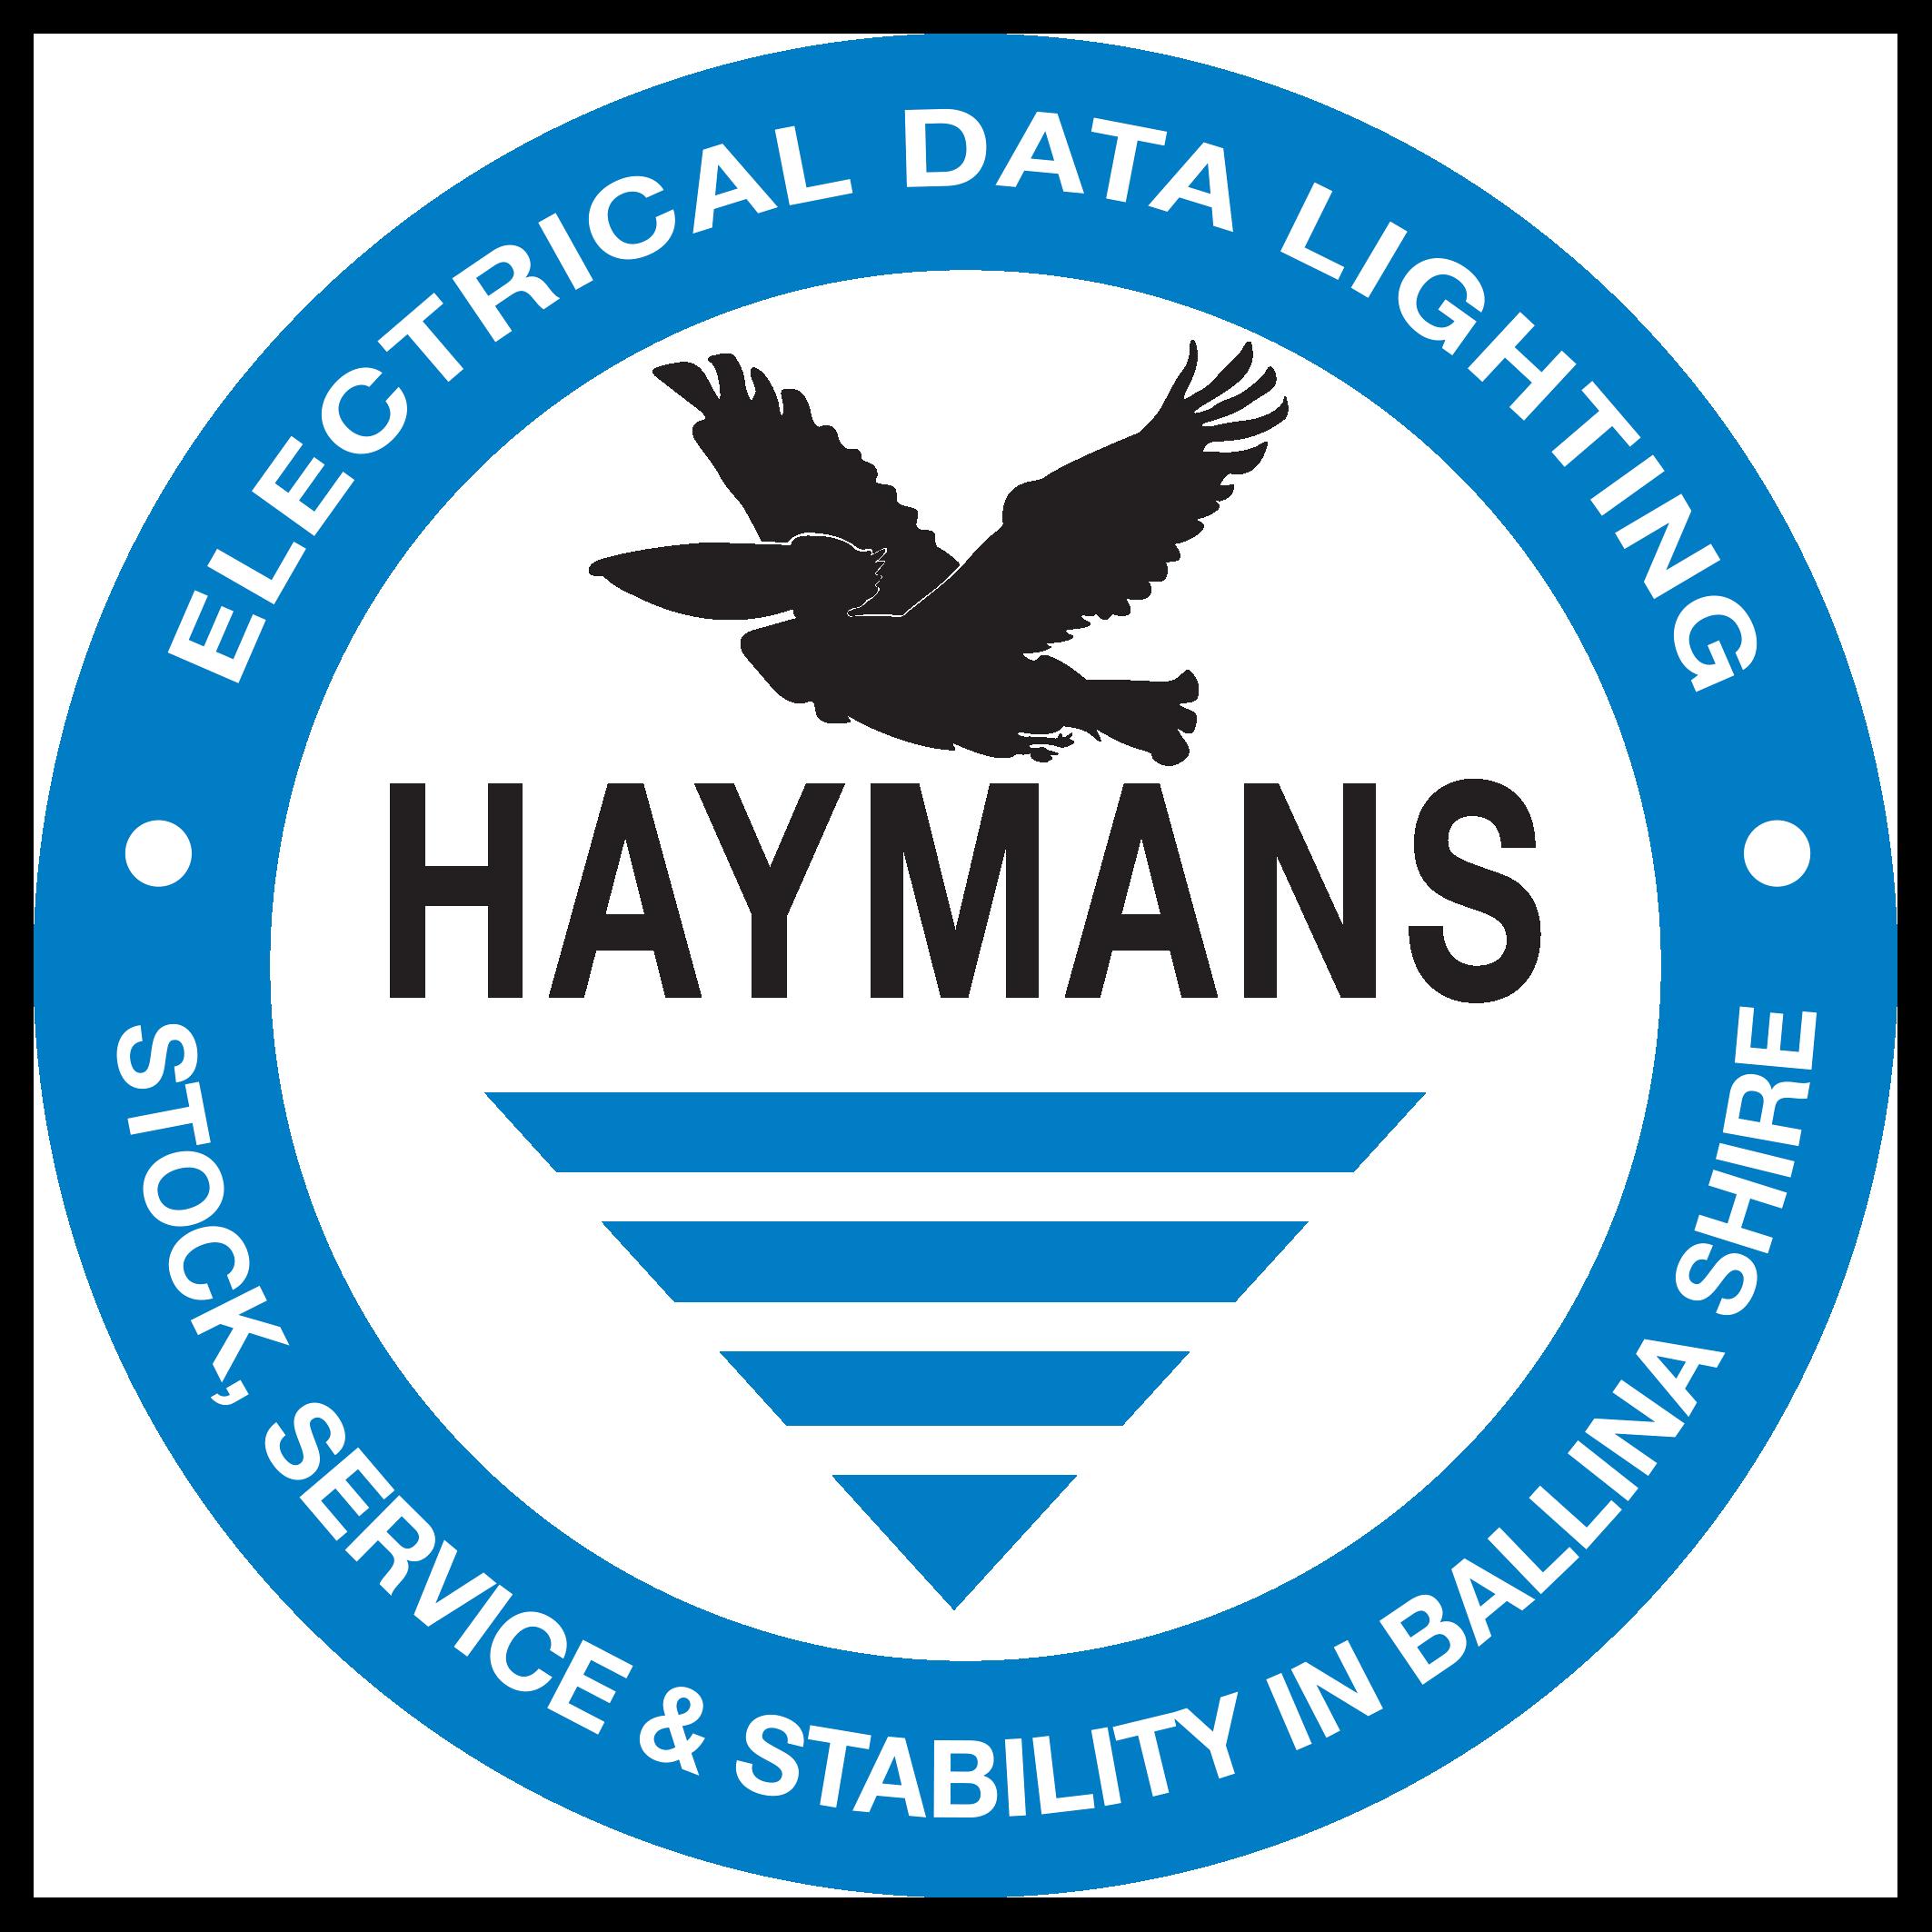 haymans-logo-new.png